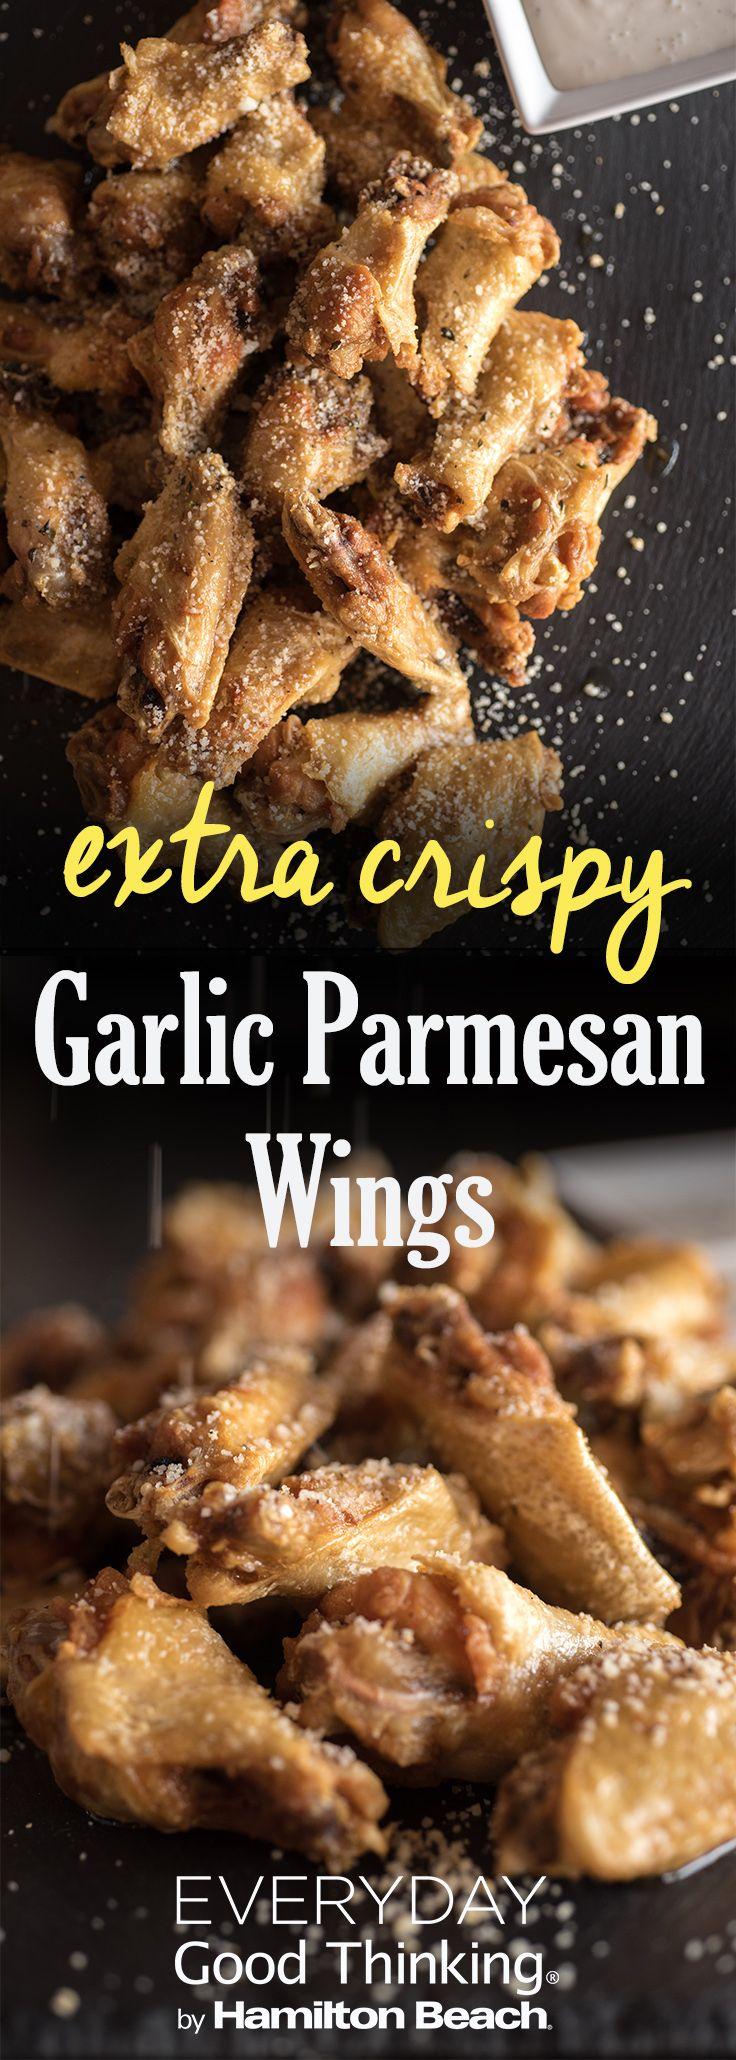 Gameday Garlic Parmesan Chicken Wings